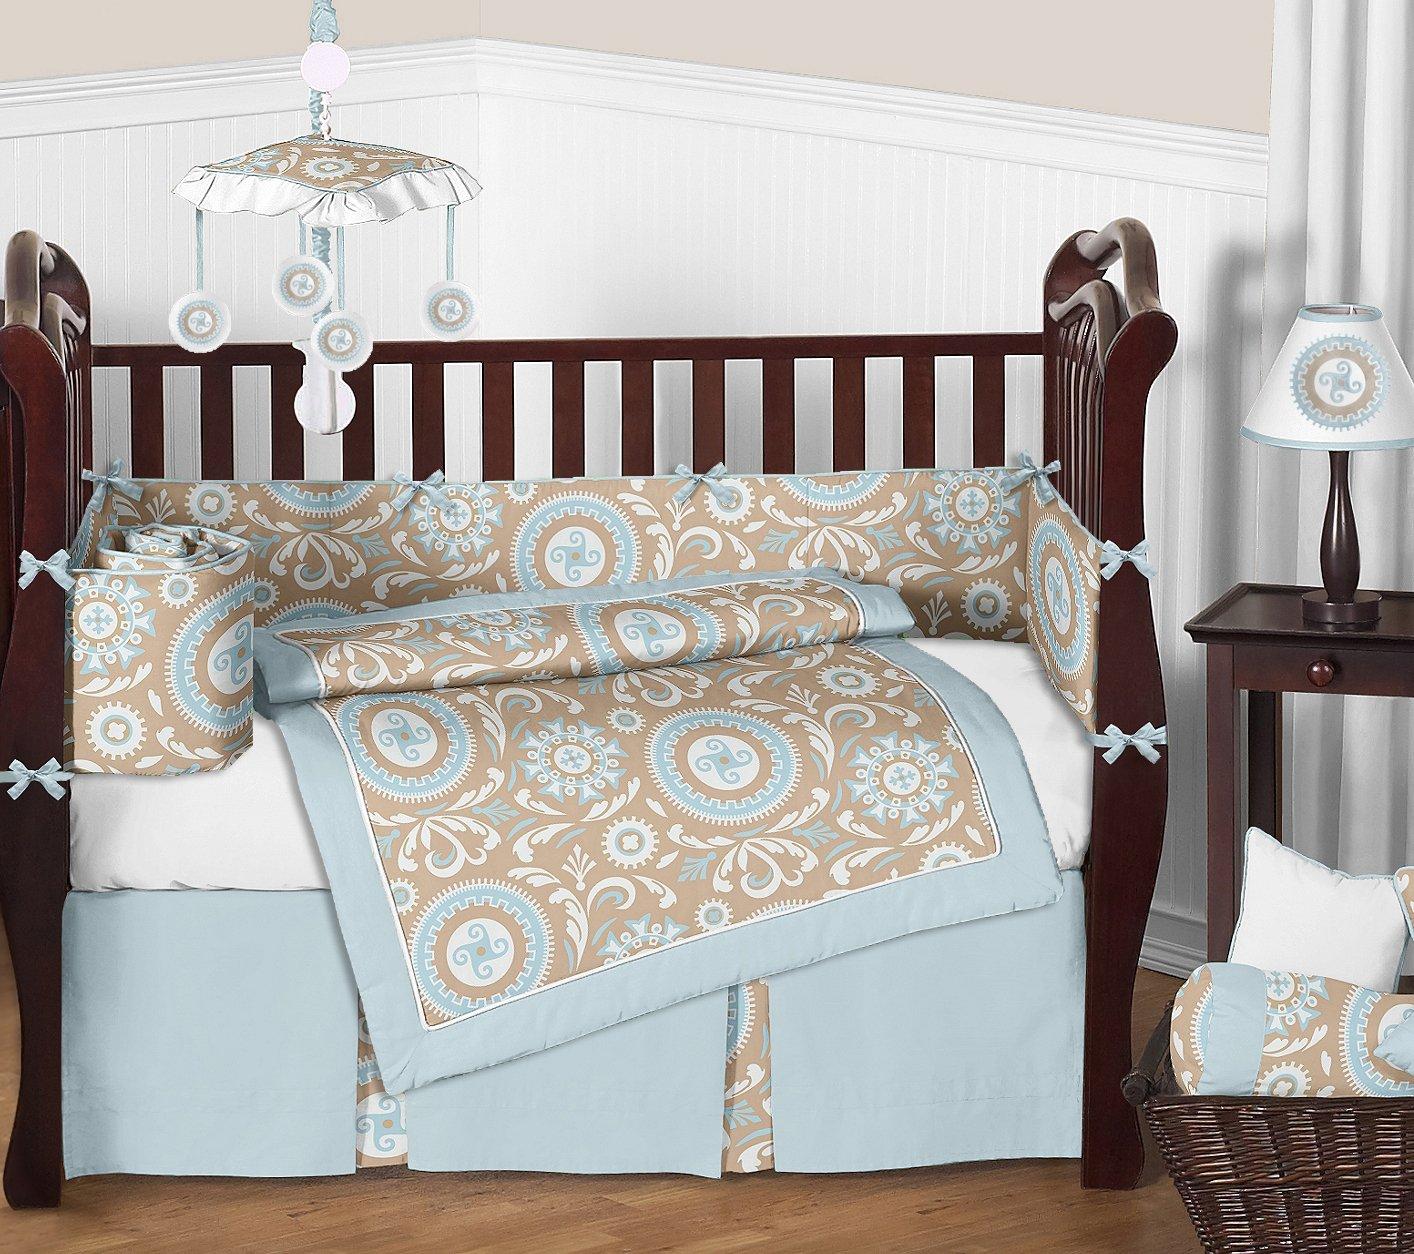 Sweet Jojo Designs 9-Piece Blue and Taupe Hayden Gender Neutral Baby Bedding Girl or Boy Crib Set